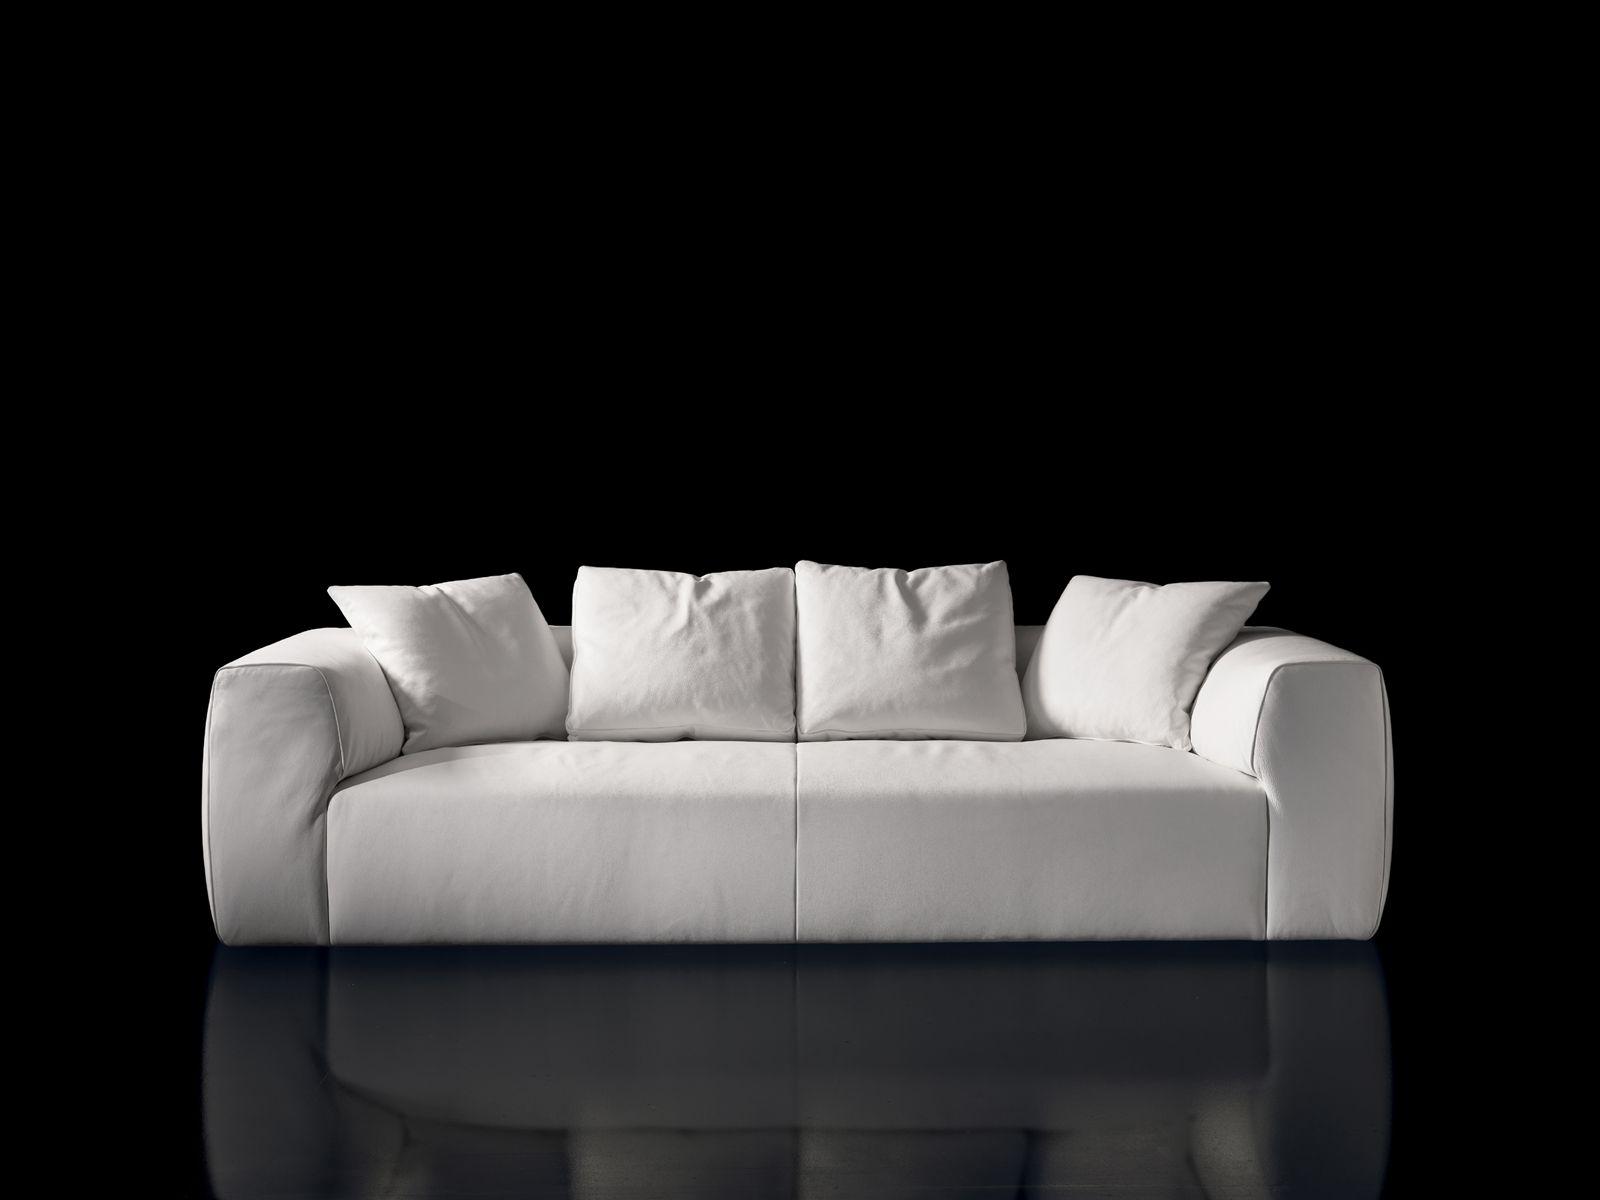 Klub divano a 2 posti by i 4 mariani design mauro lipparini for I 4 mariani